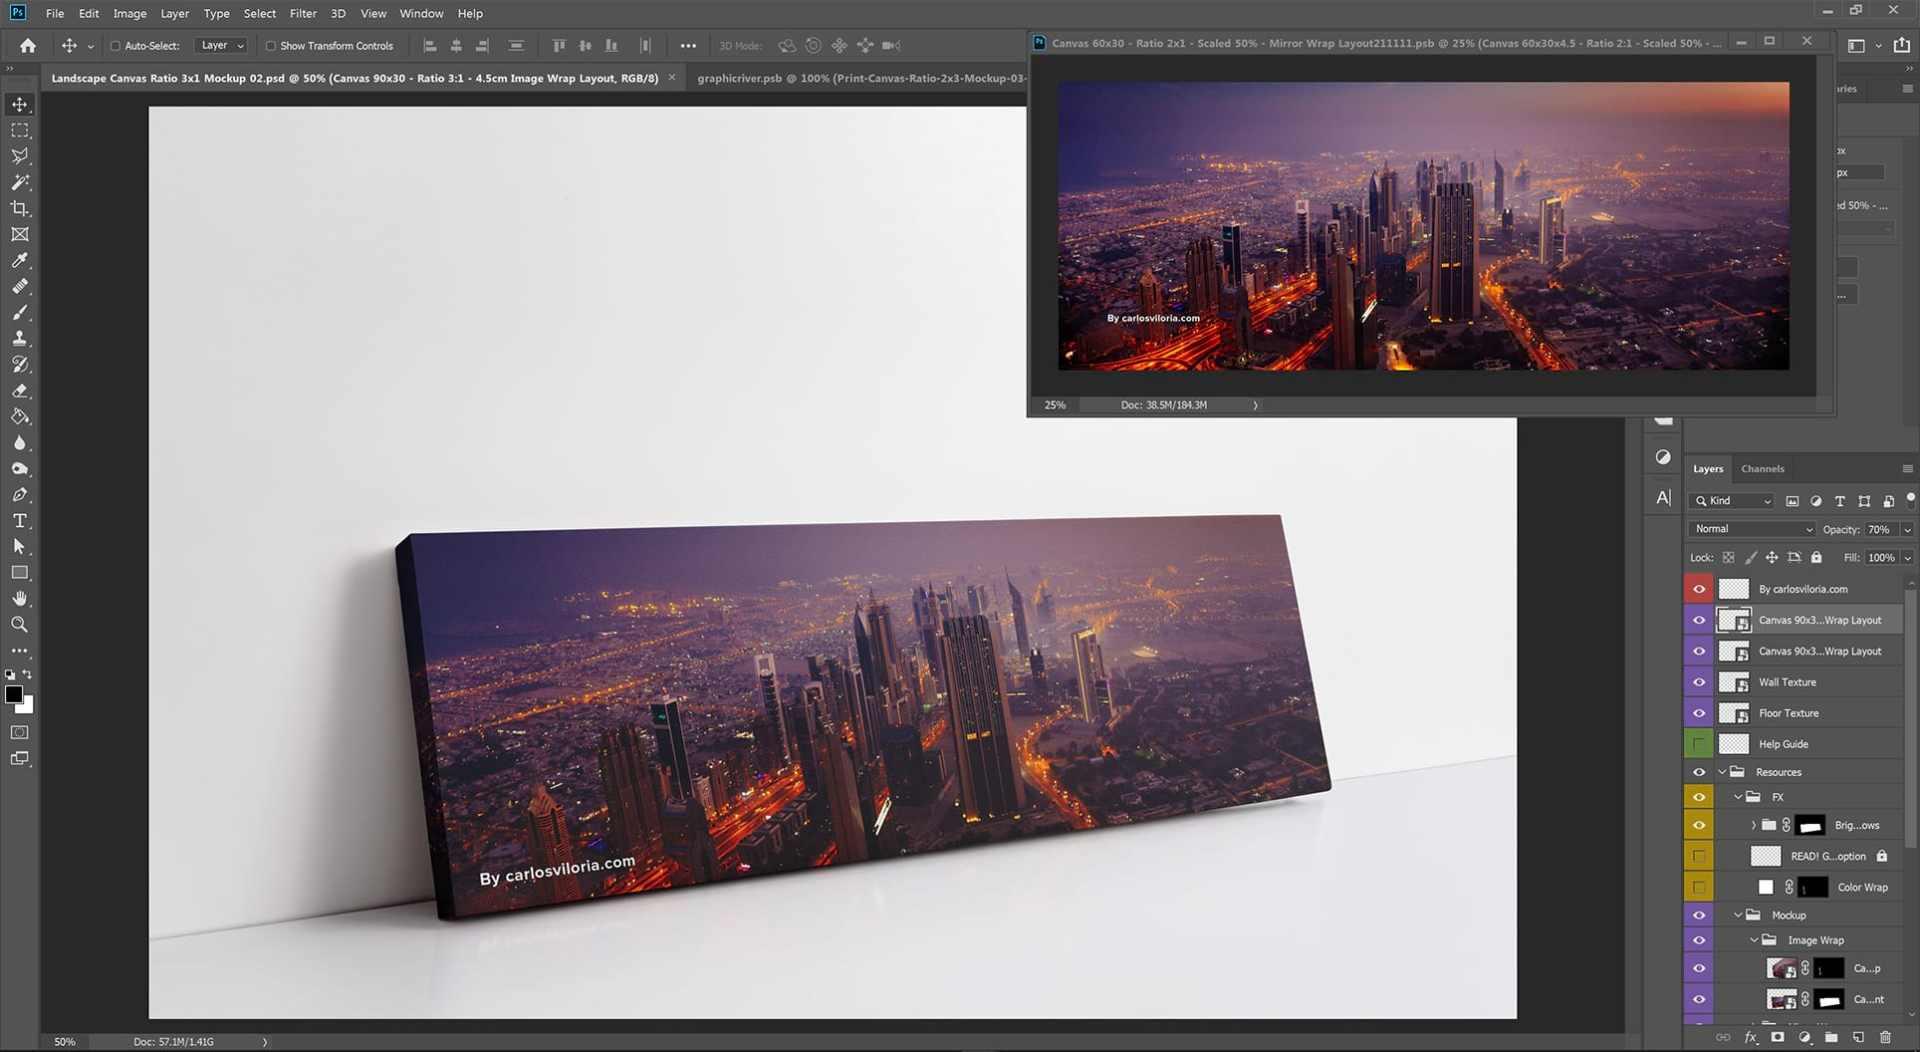 Landscape Canvas ratio 3x1 Mockup